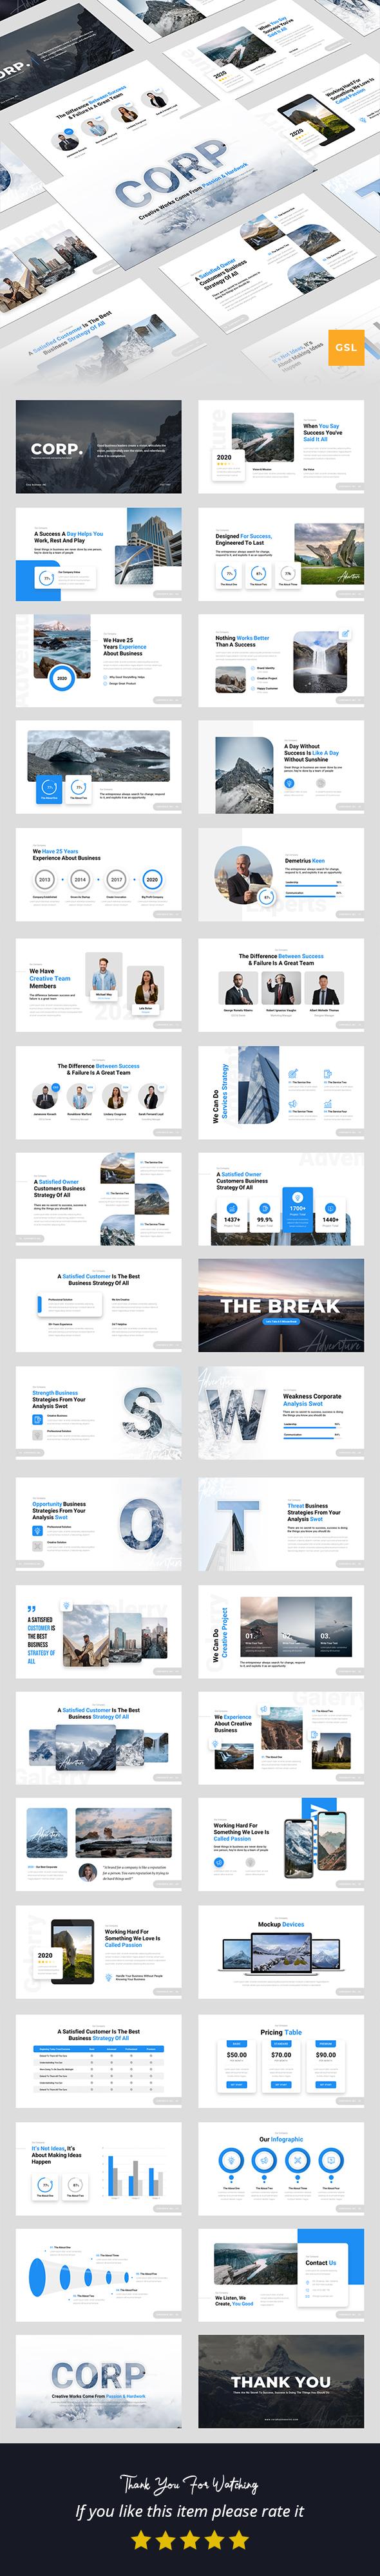 Corp - Creative Business Google Slides Presentation Template